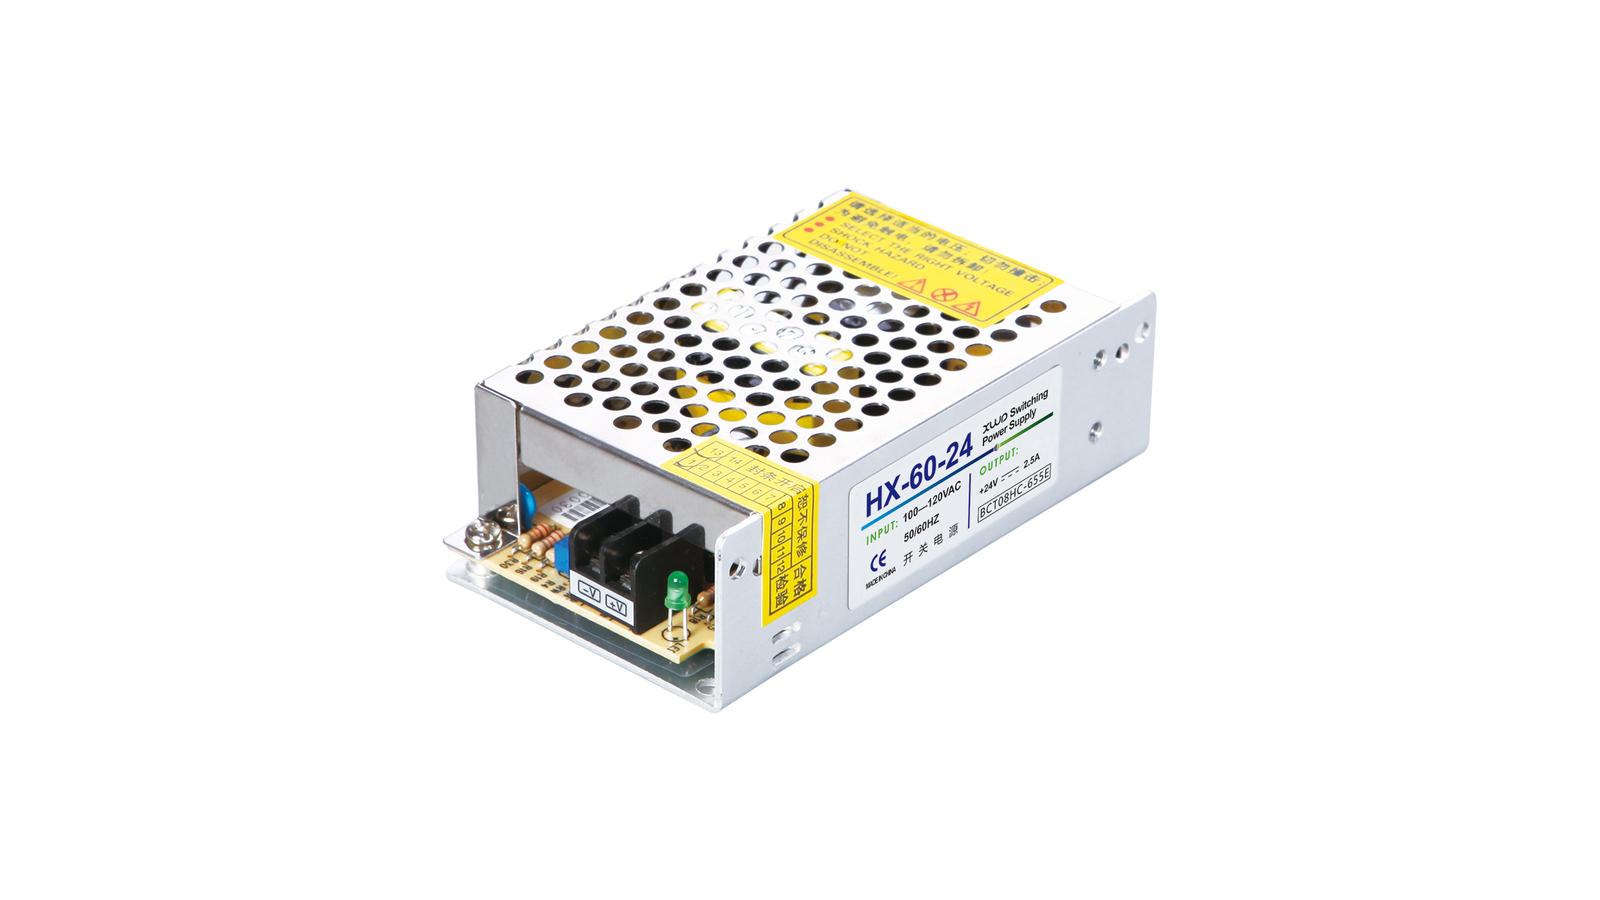 Kit: 60W Power Supply + 8' LED Strip, Bright White, Hi-Lumen